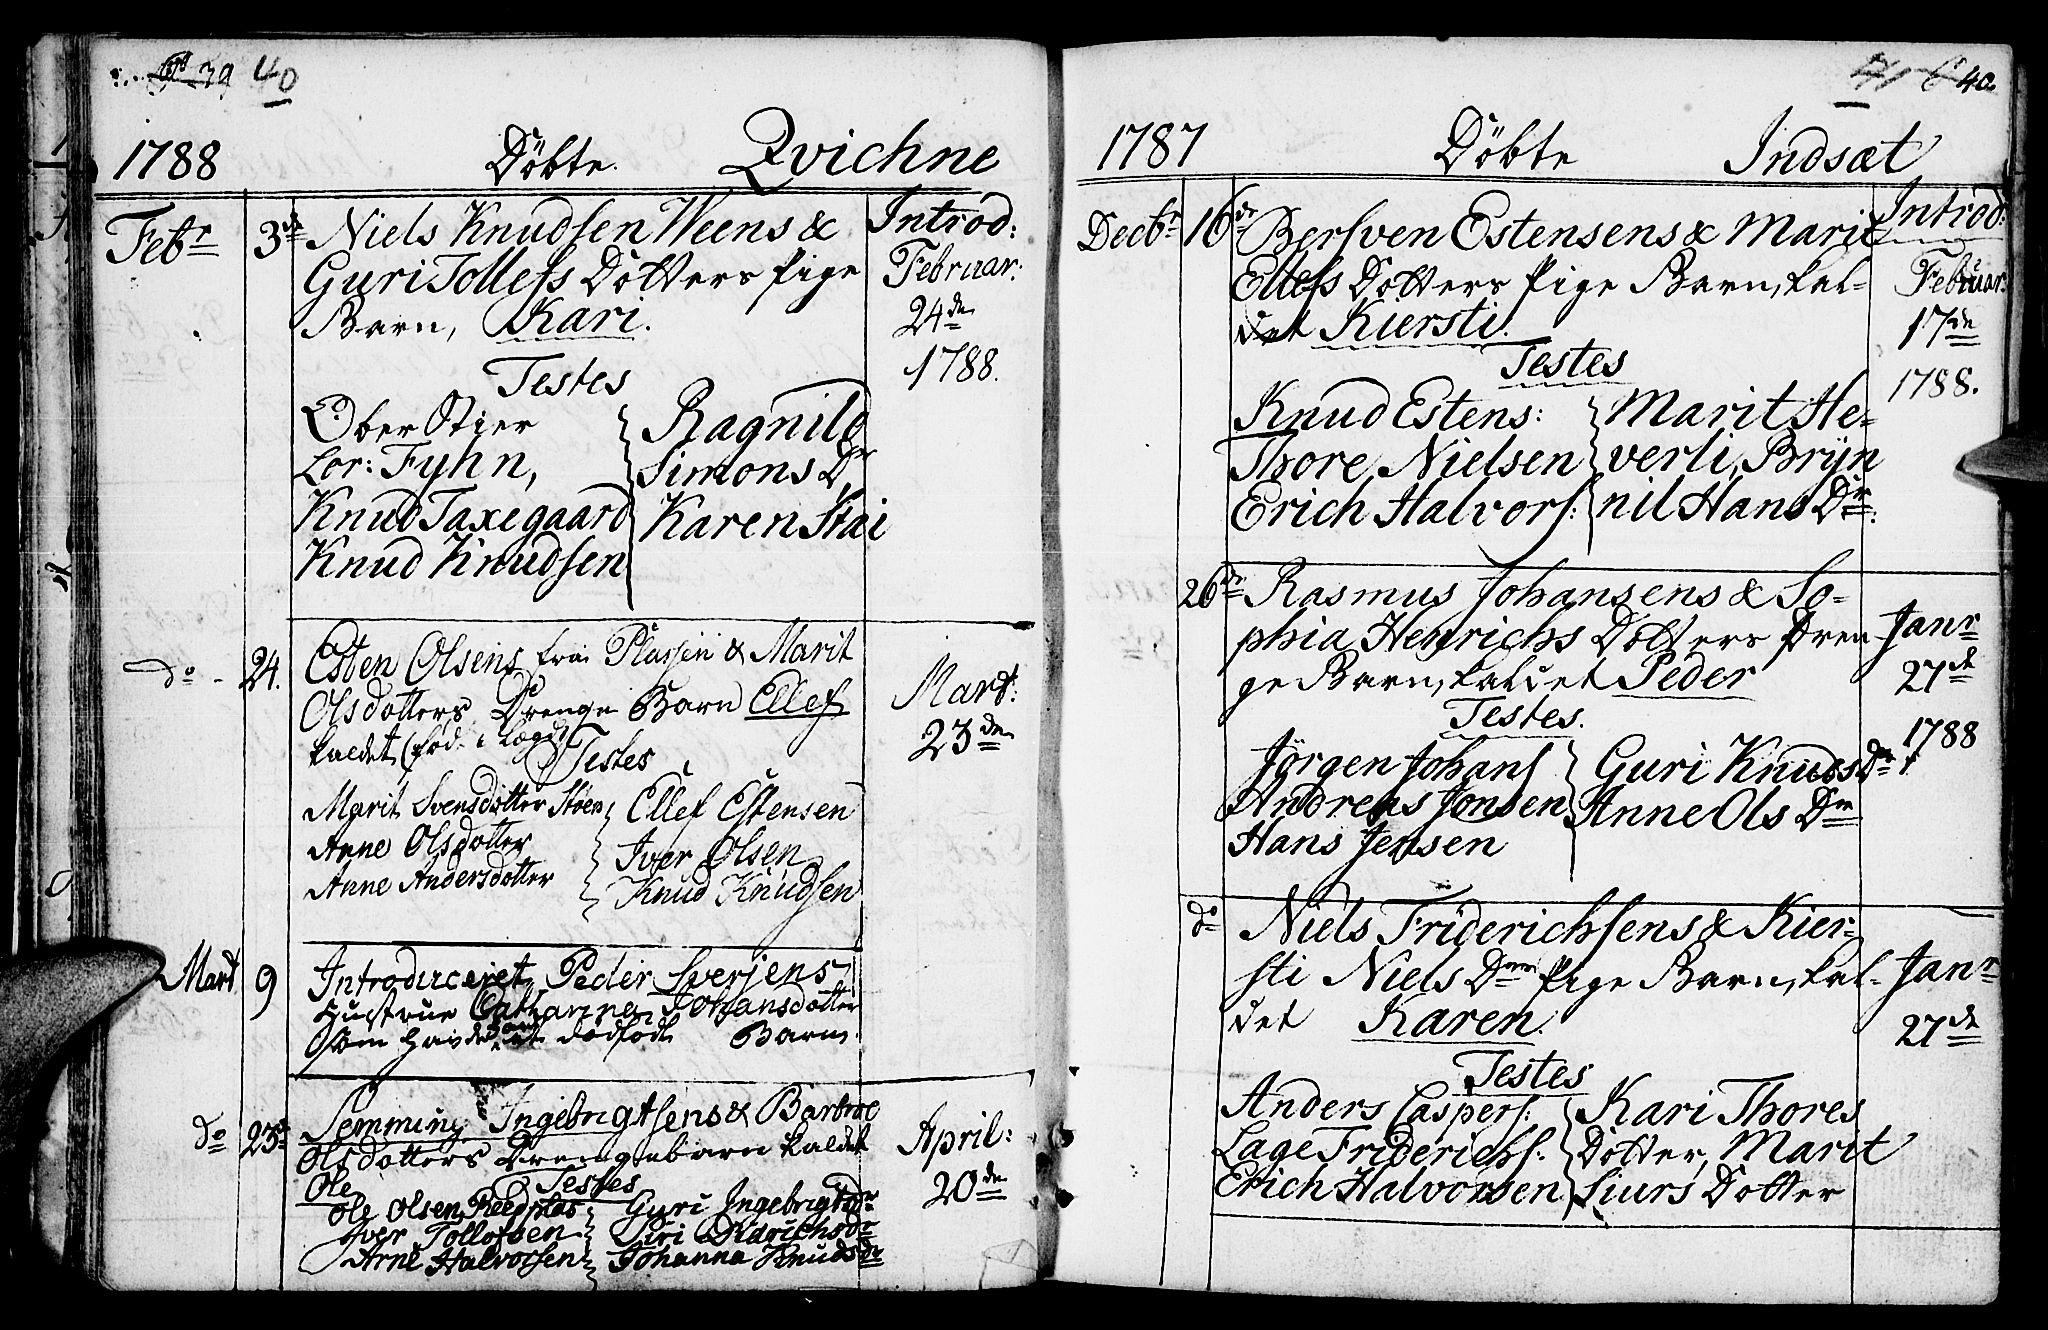 SAH, Kvikne prestekontor, Ministerialbok nr. 3, 1785-1814, s. 40-41